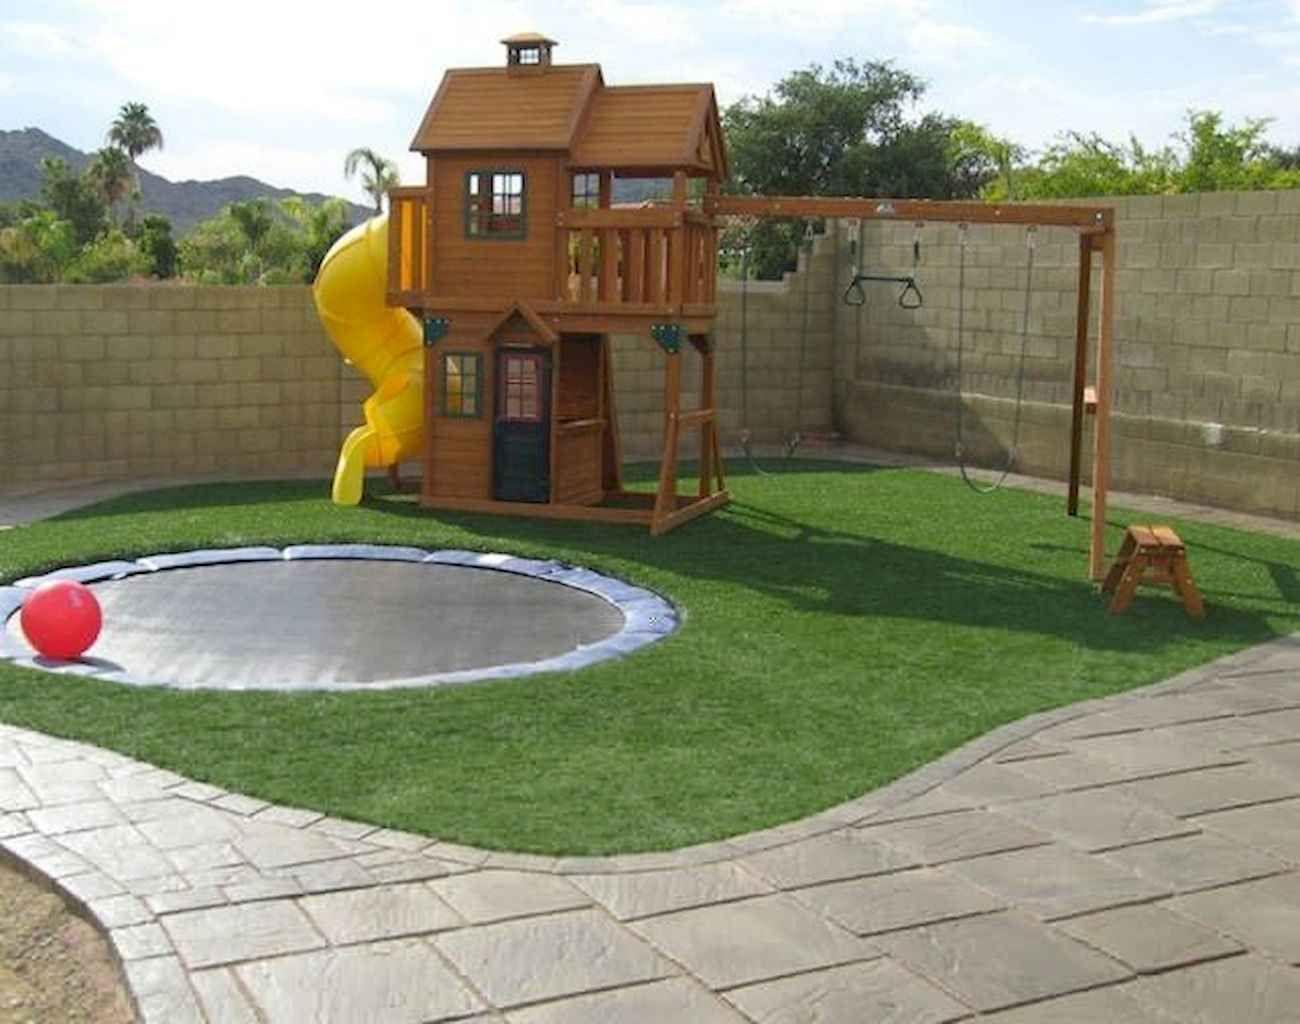 36 Exciting Small Backyard Playground Kids Design Ideas